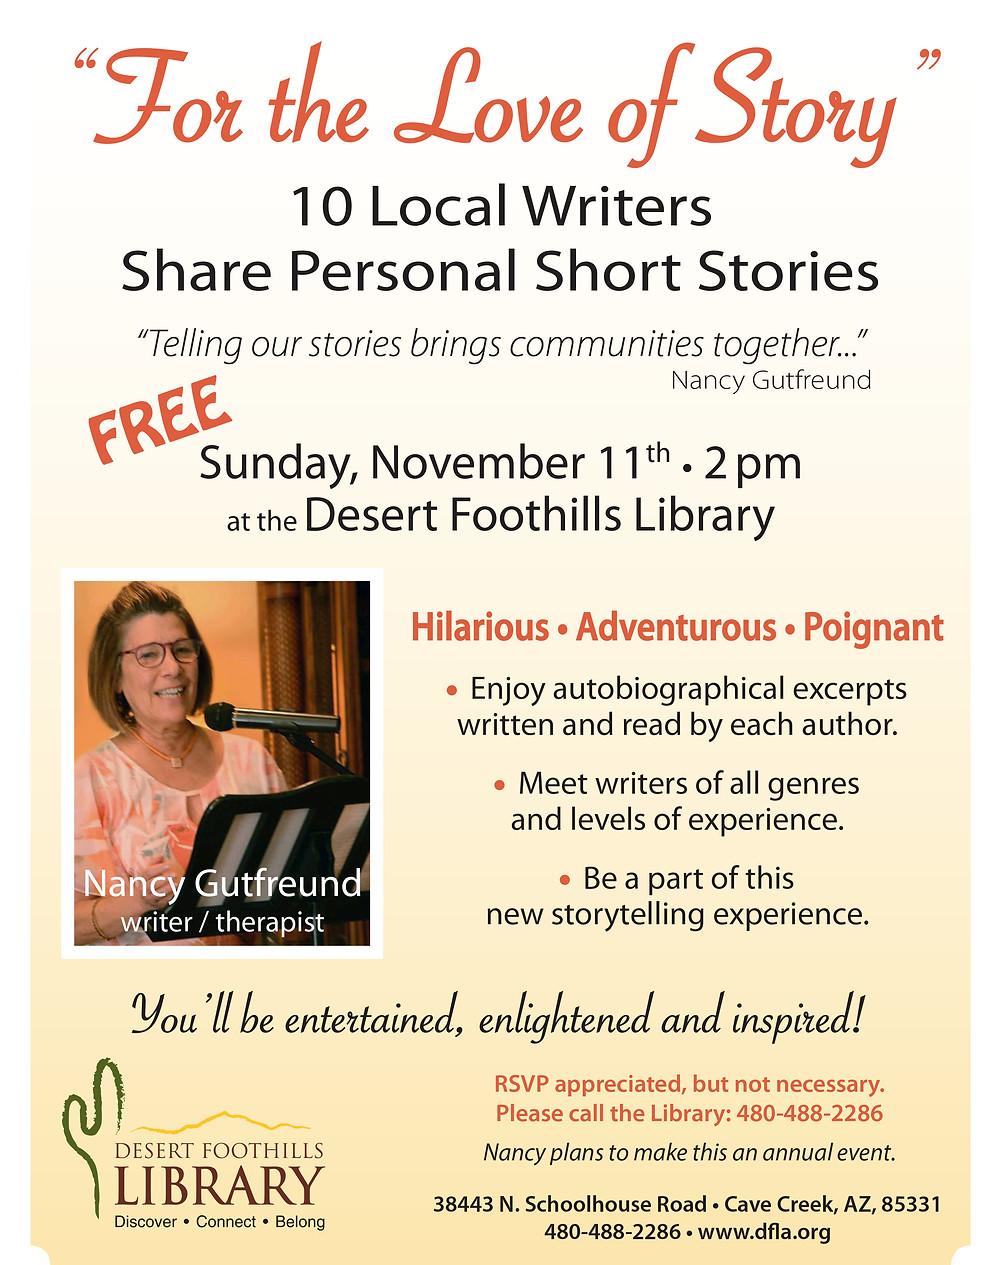 For the Love of Story, Arizona Author, Writer in Arizona, Memoir, Alzheimer Coach, Life Coach, Alzheimer Help